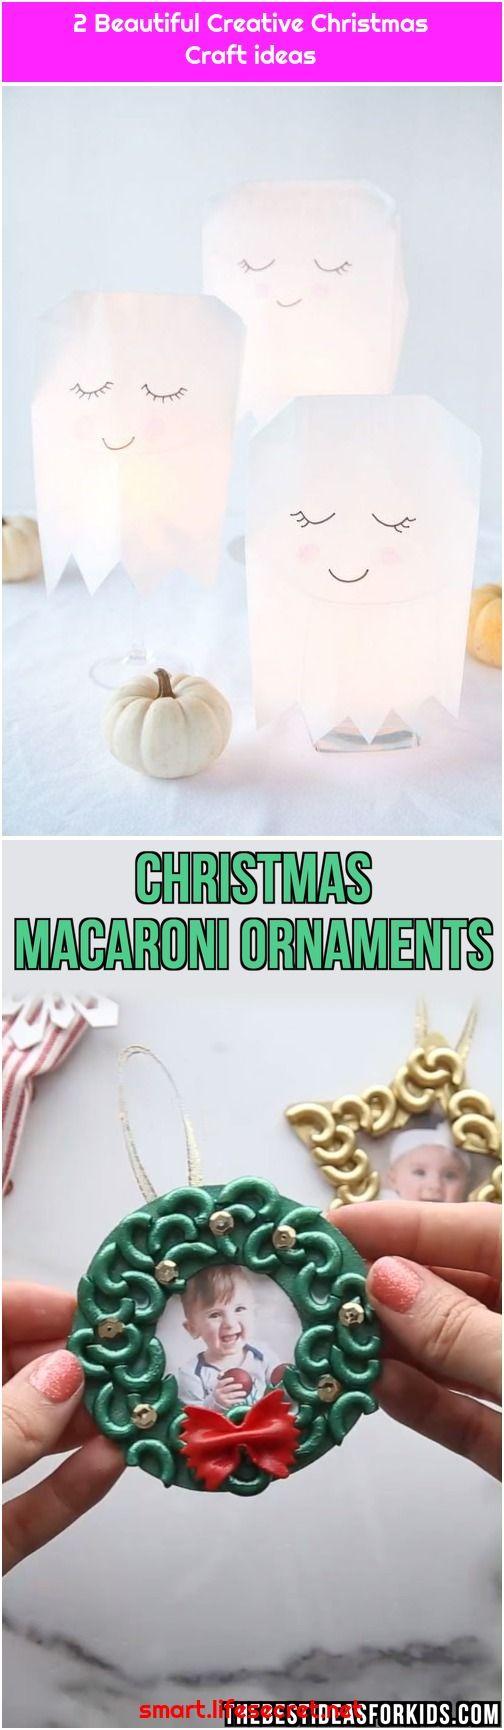 2 Beautiful Creative Christmas Craft ideas #geisterbasteln